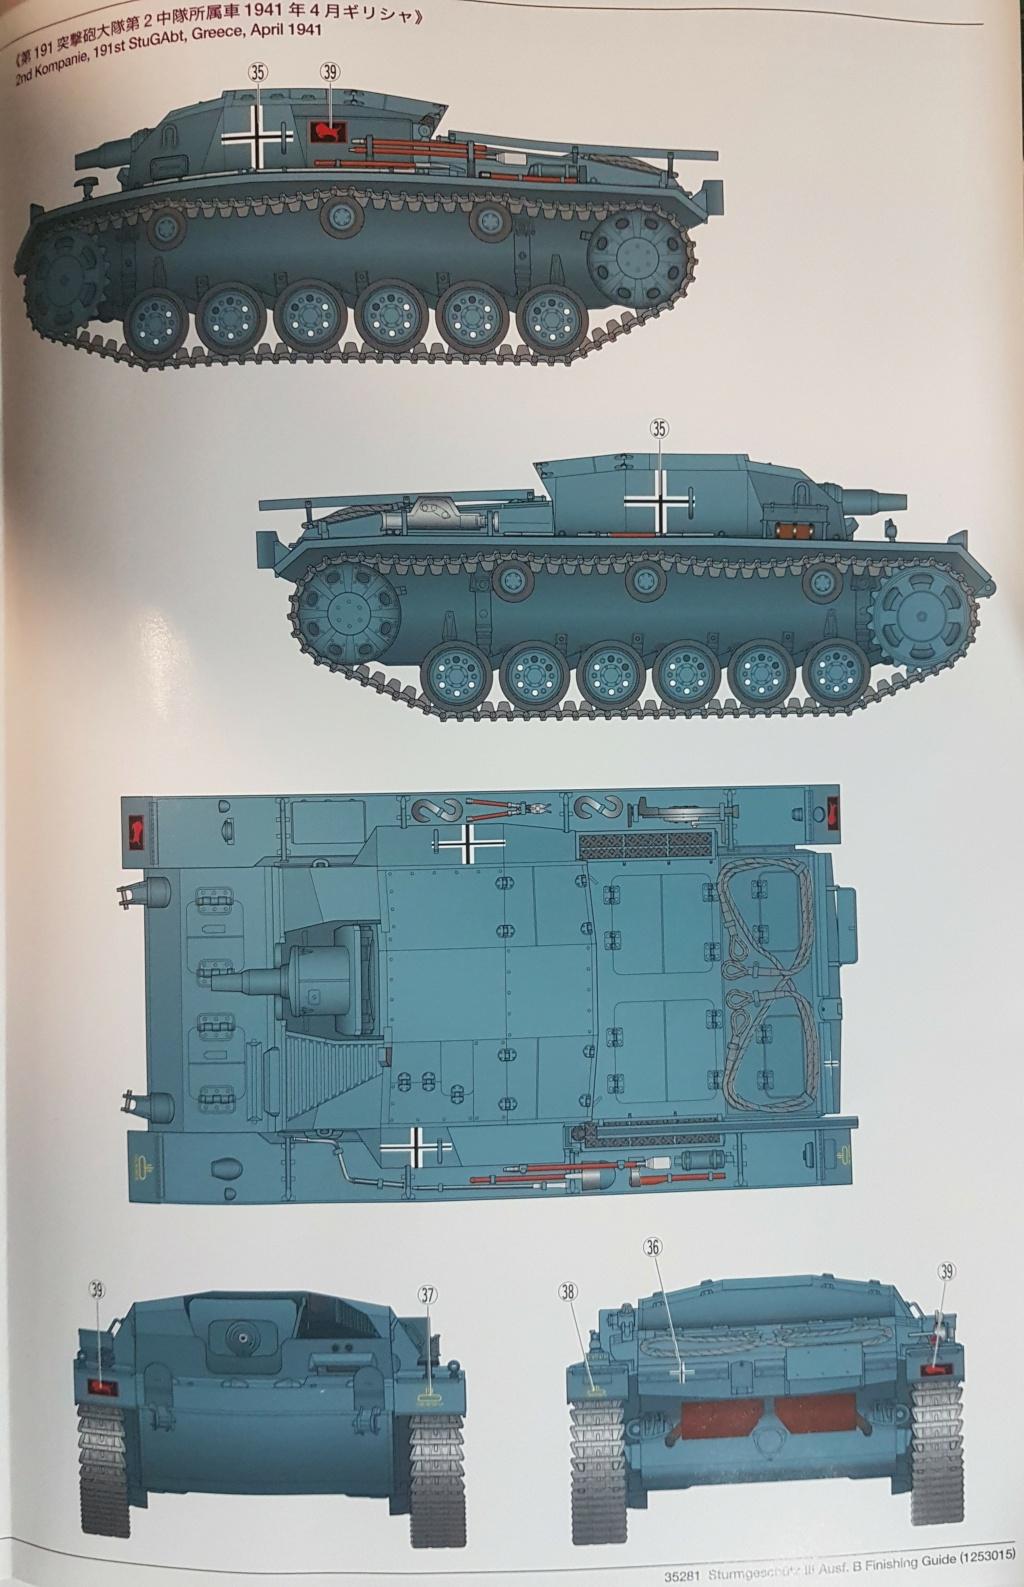 From the box - stug III Ausf.B tamiya 1/35 20210934